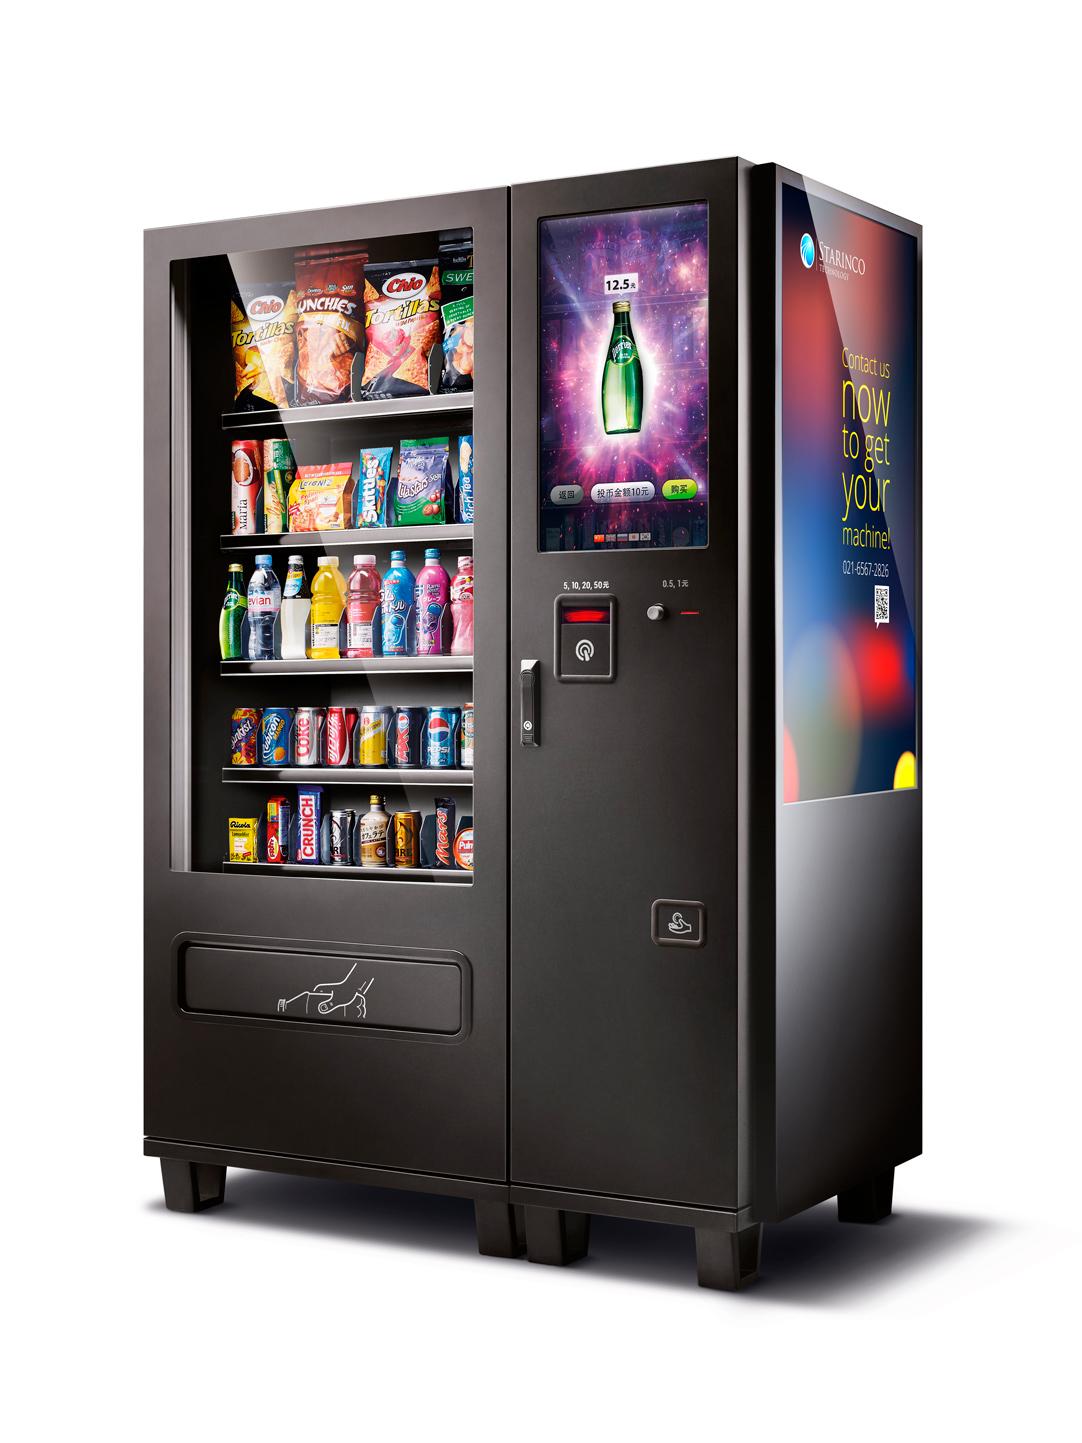 Kegu Motor Provide Gearbox For Vending machine